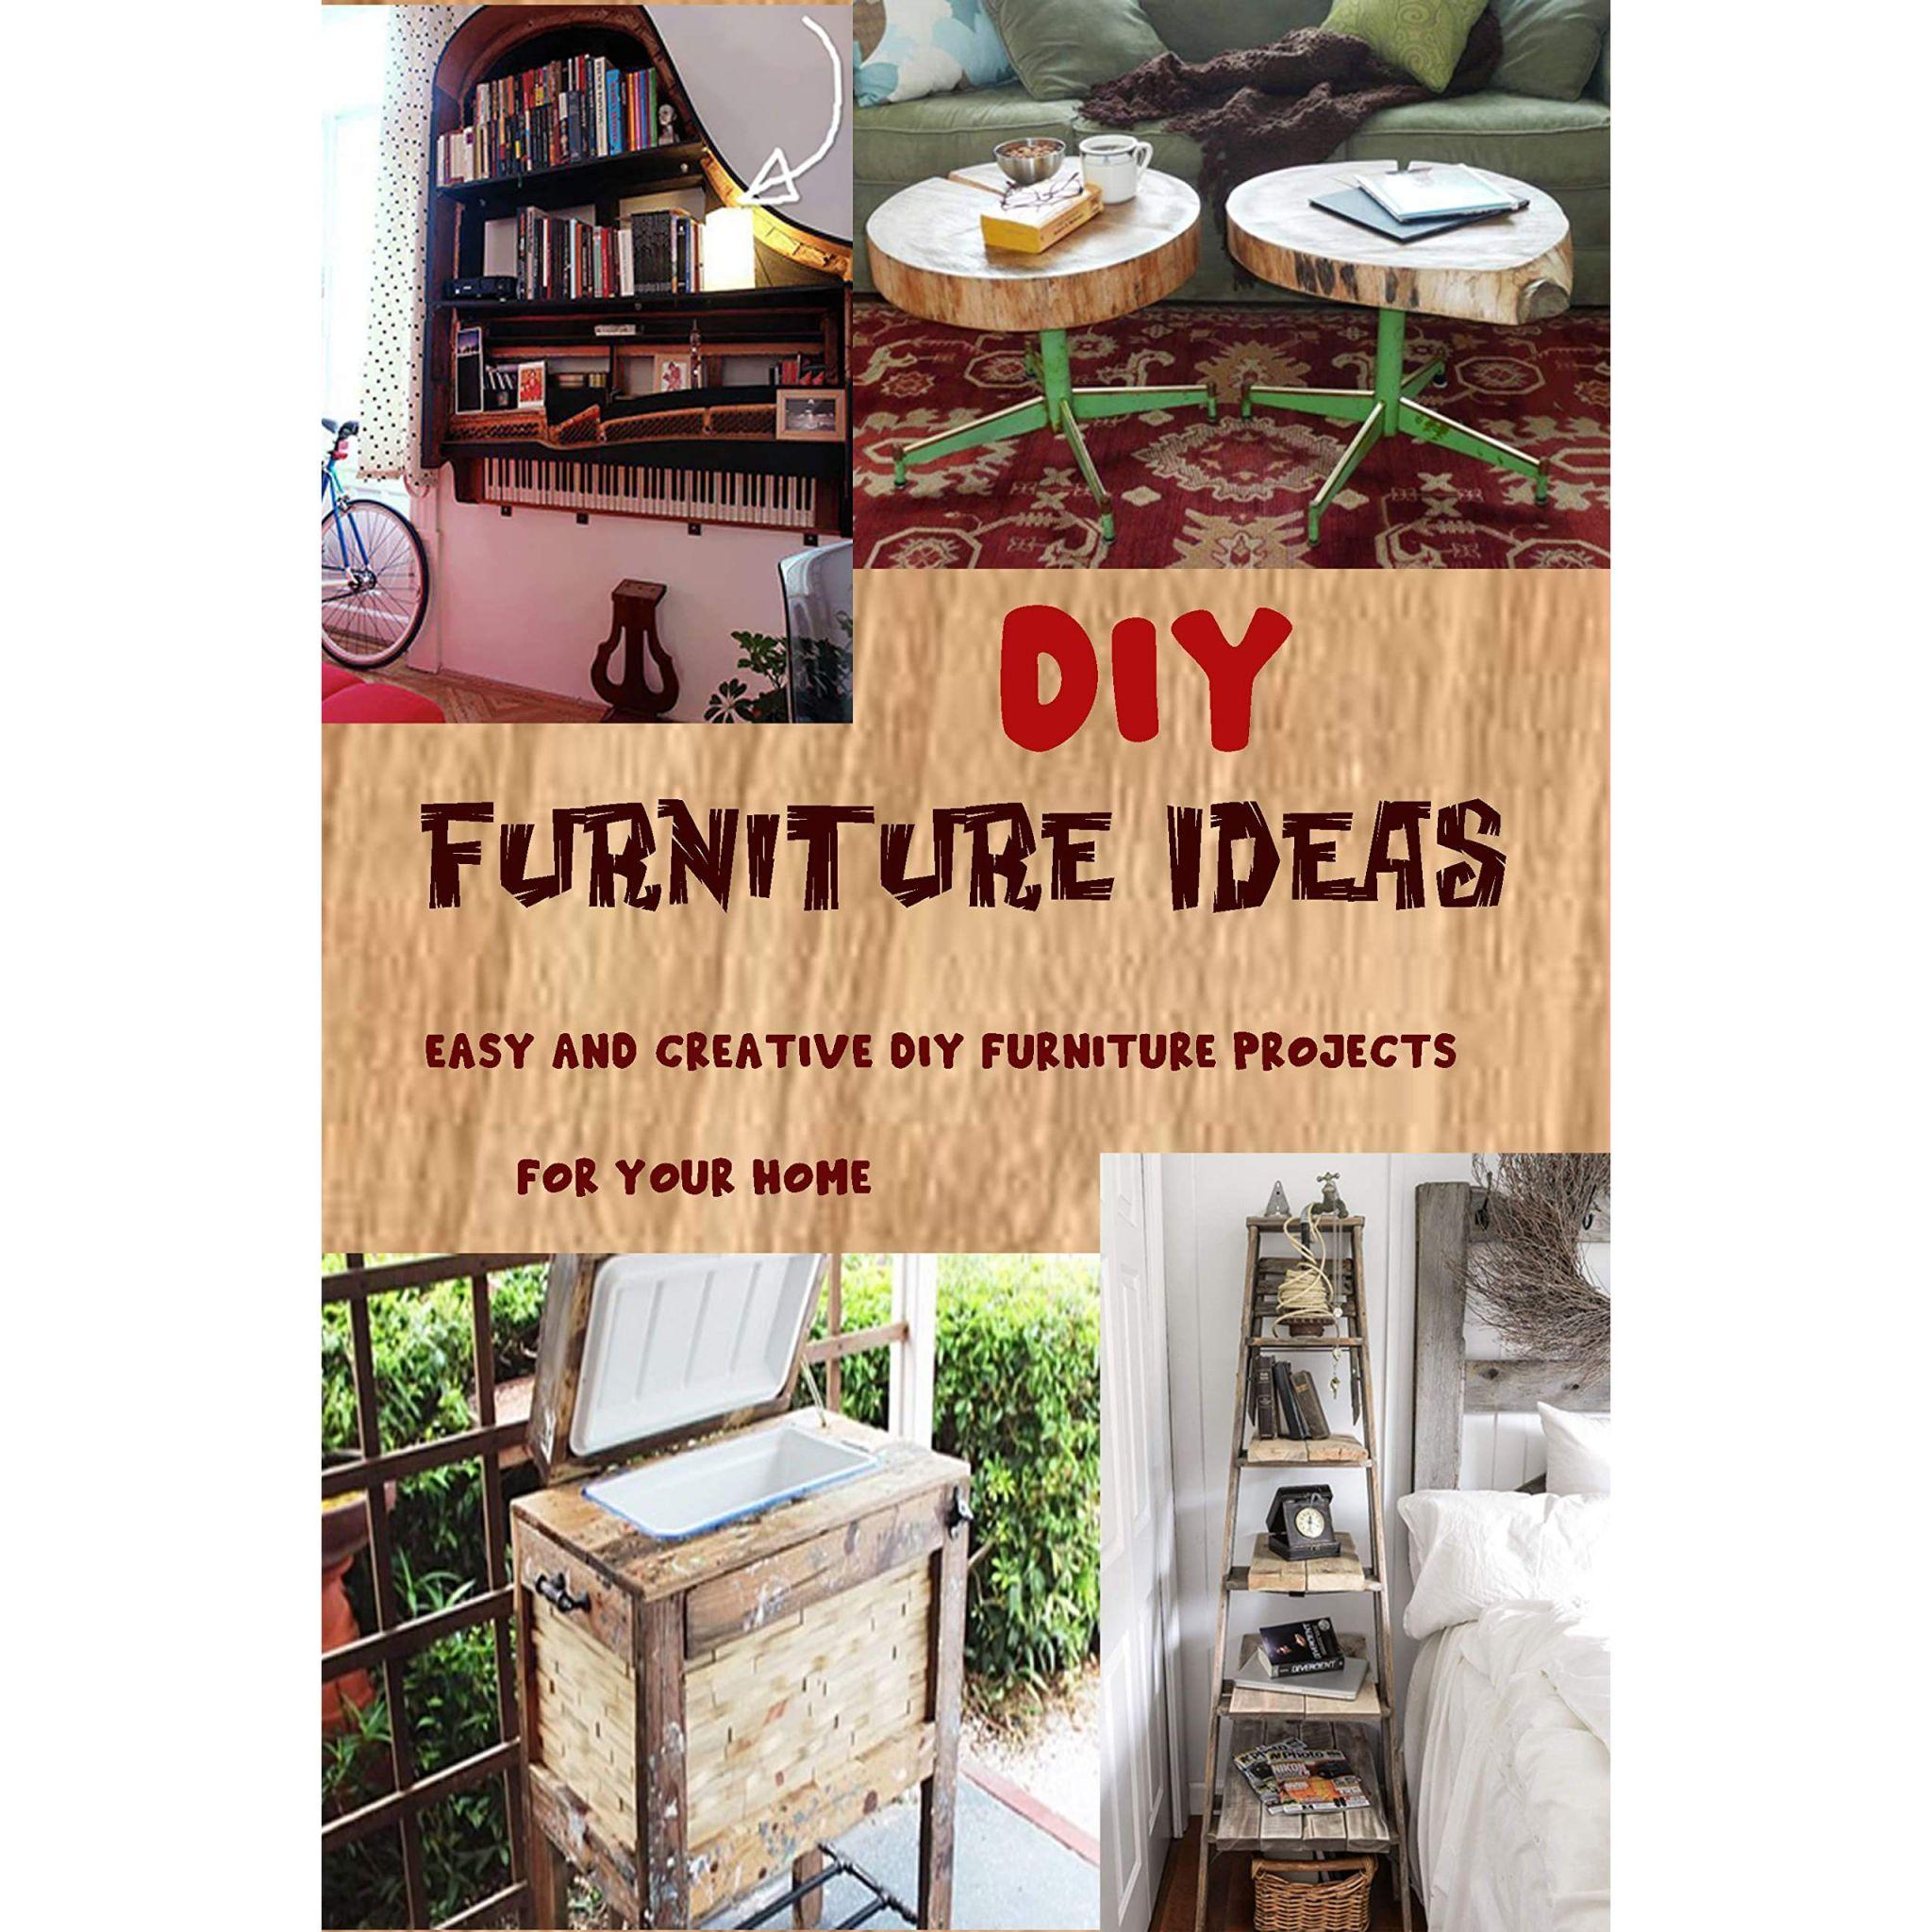 Top creative diy furniture ideas